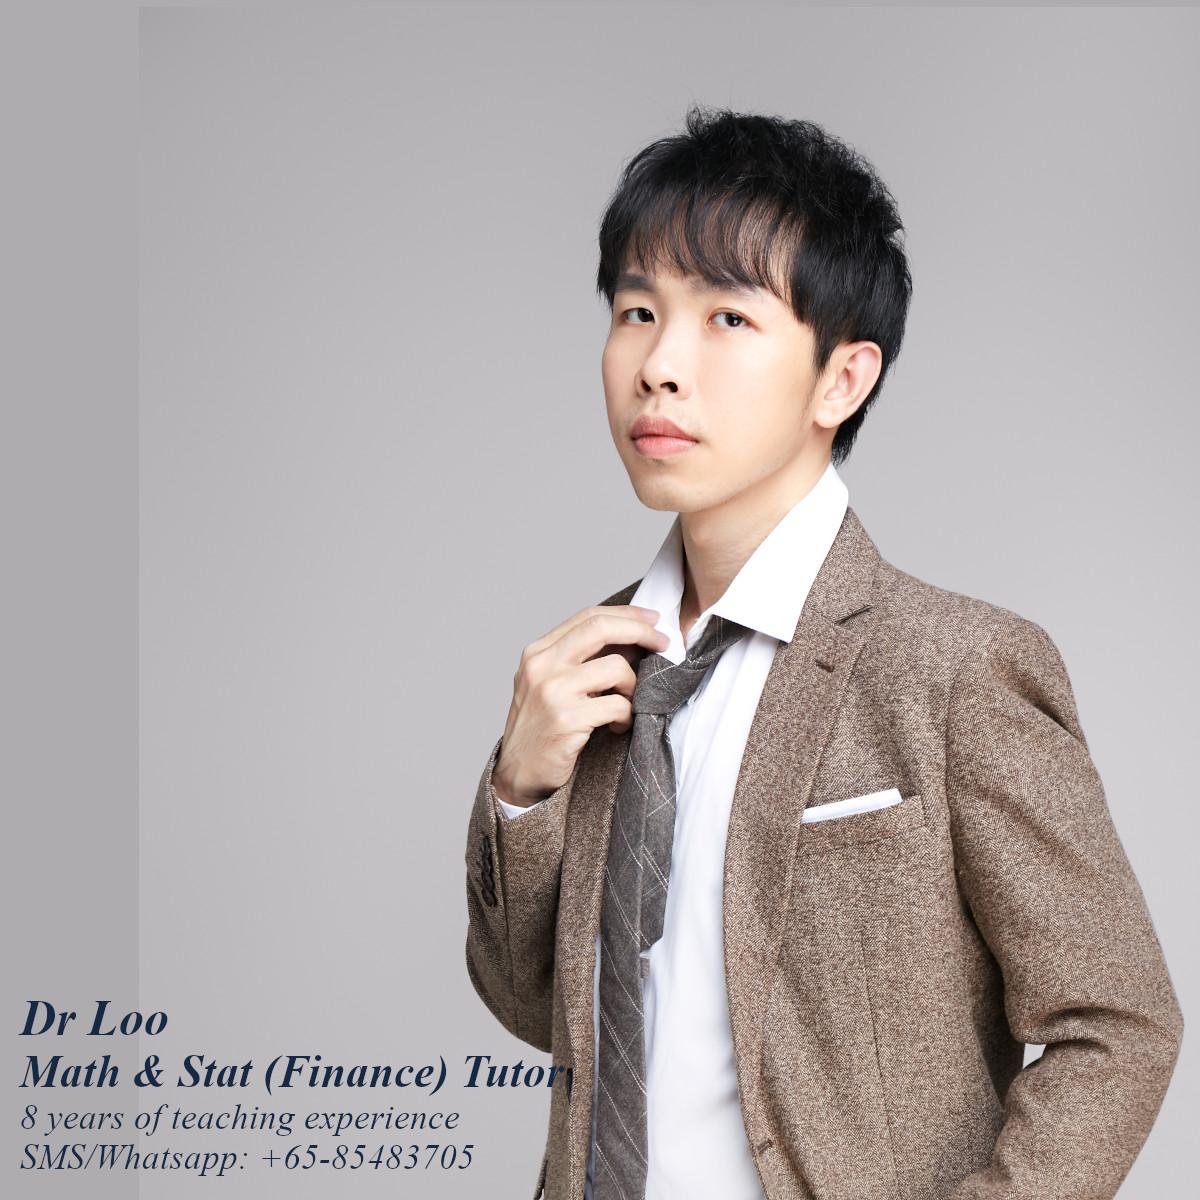 Mathematics & Statistics for Finance Tutor in Singapore